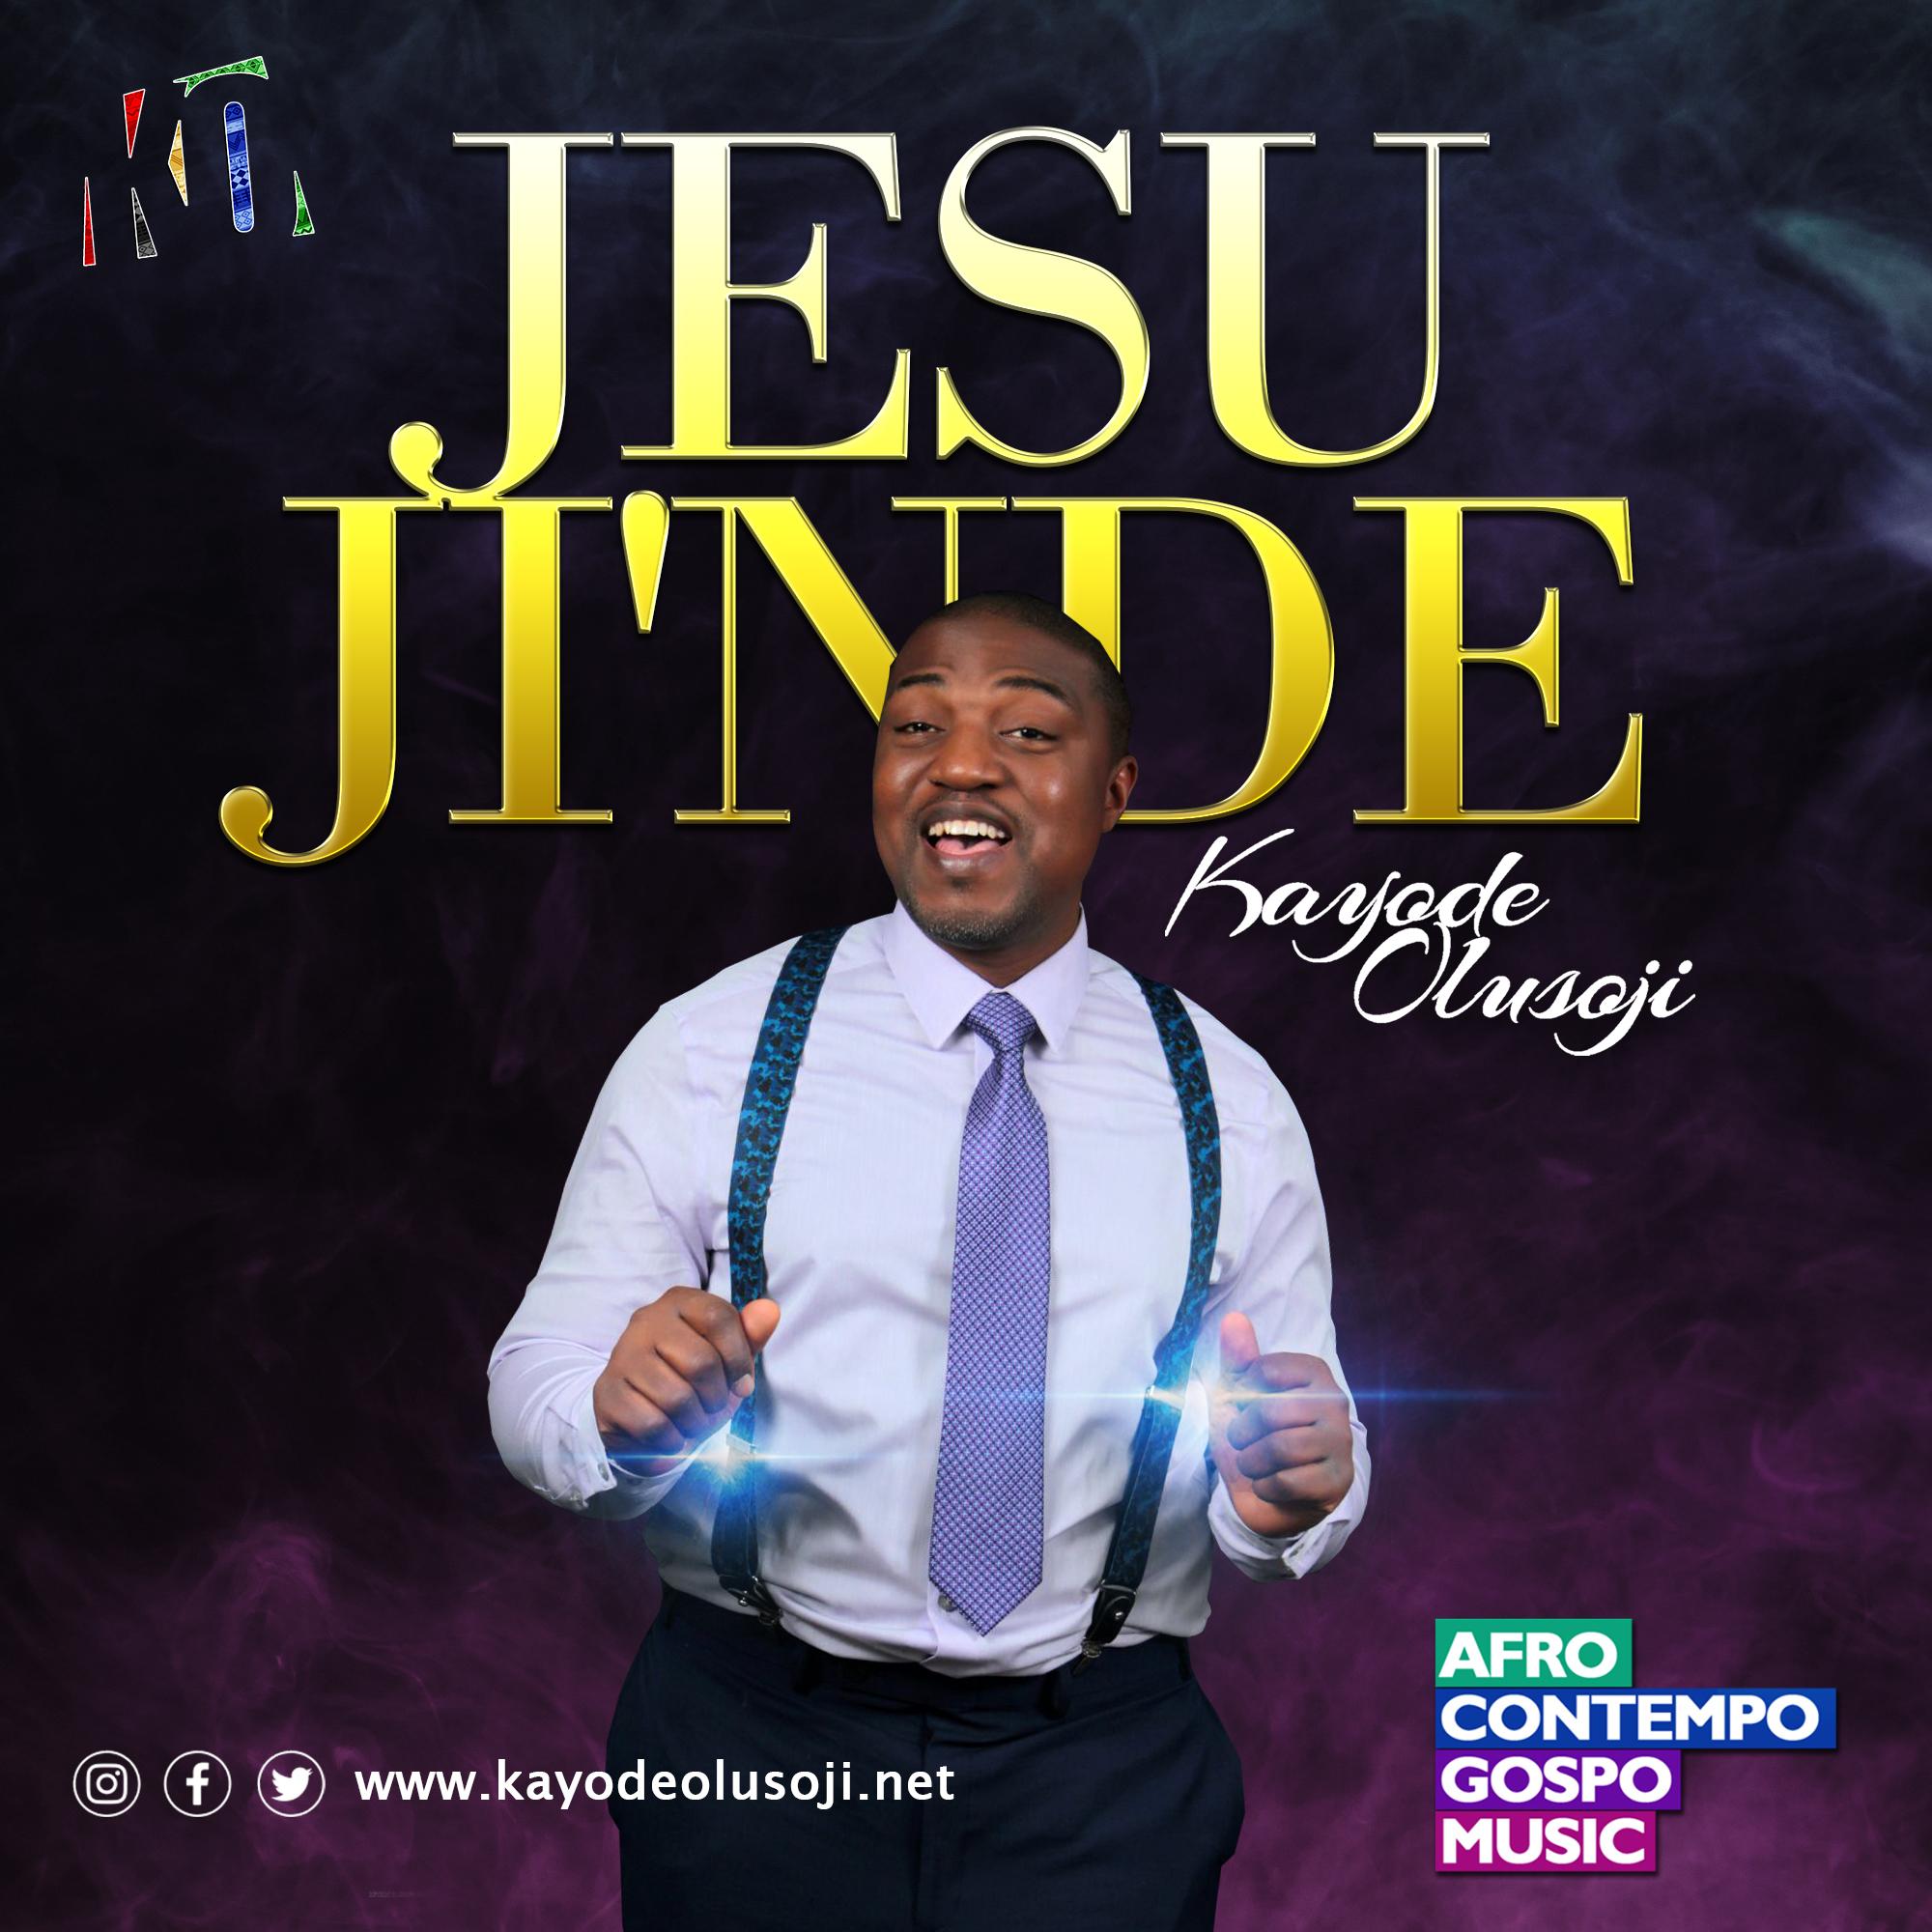 Kayode Olusoji Jesu Jinde Gospel Artist